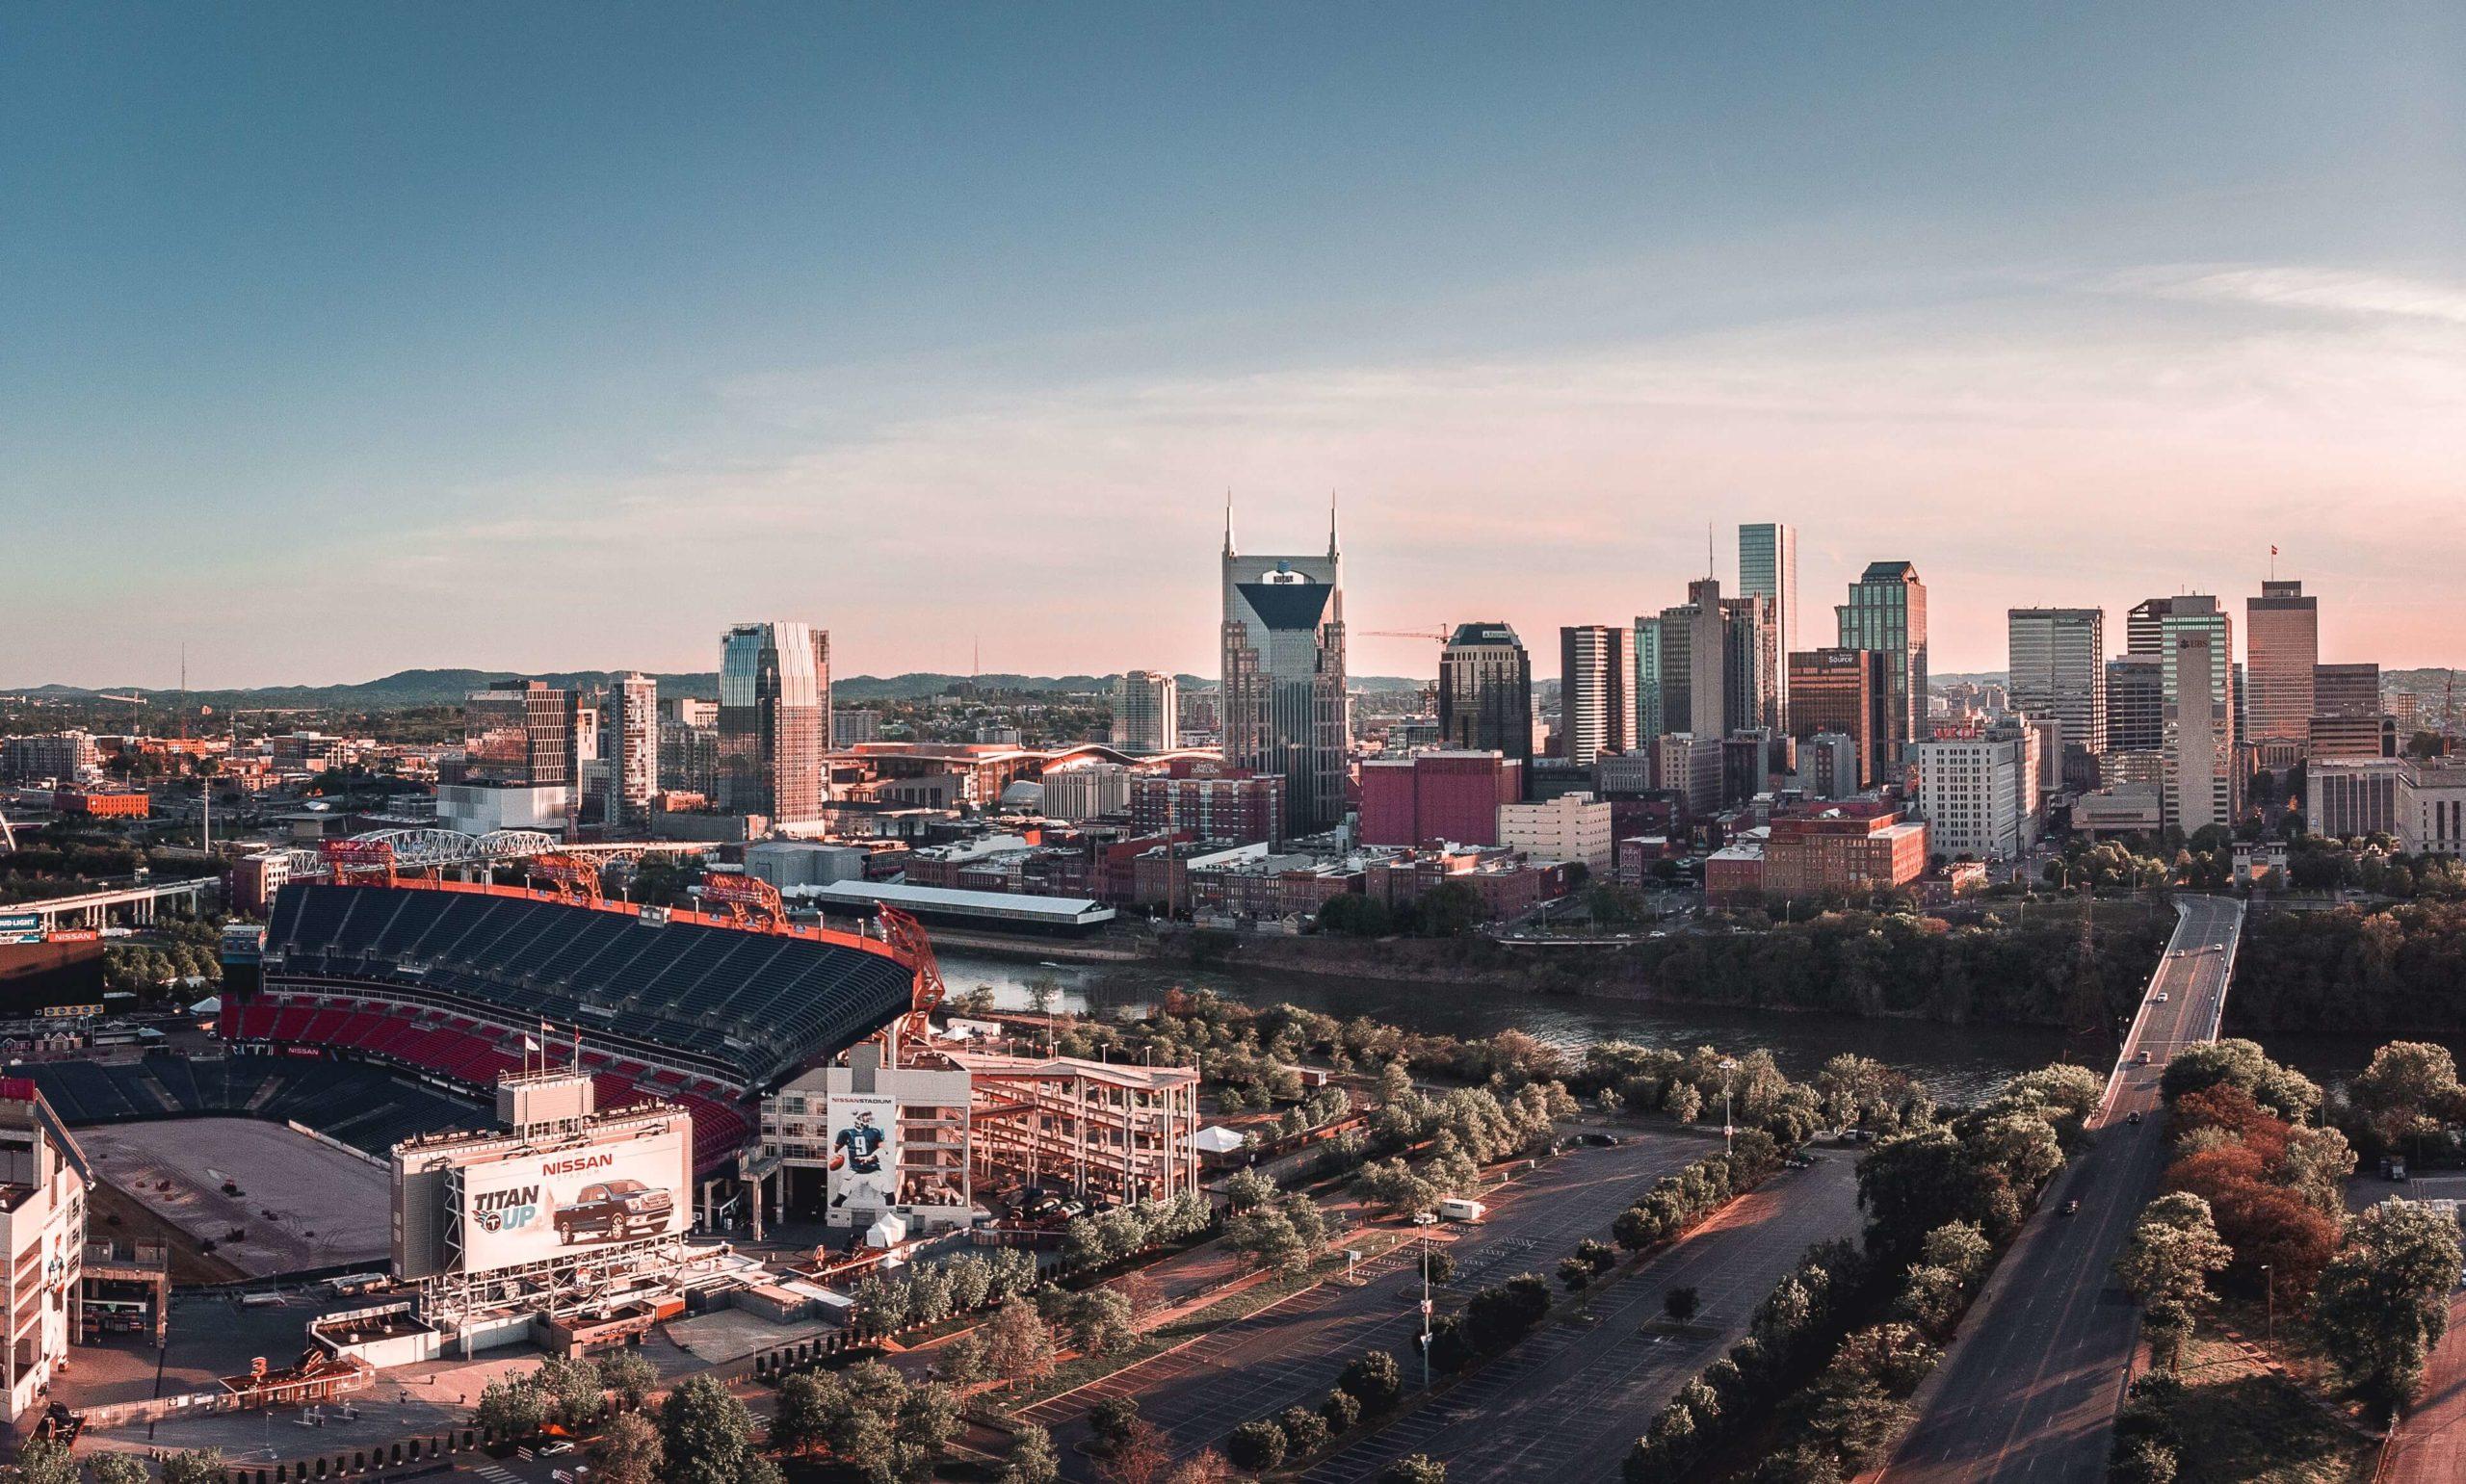 Nashville travel guide: Win a getaway with KOA!